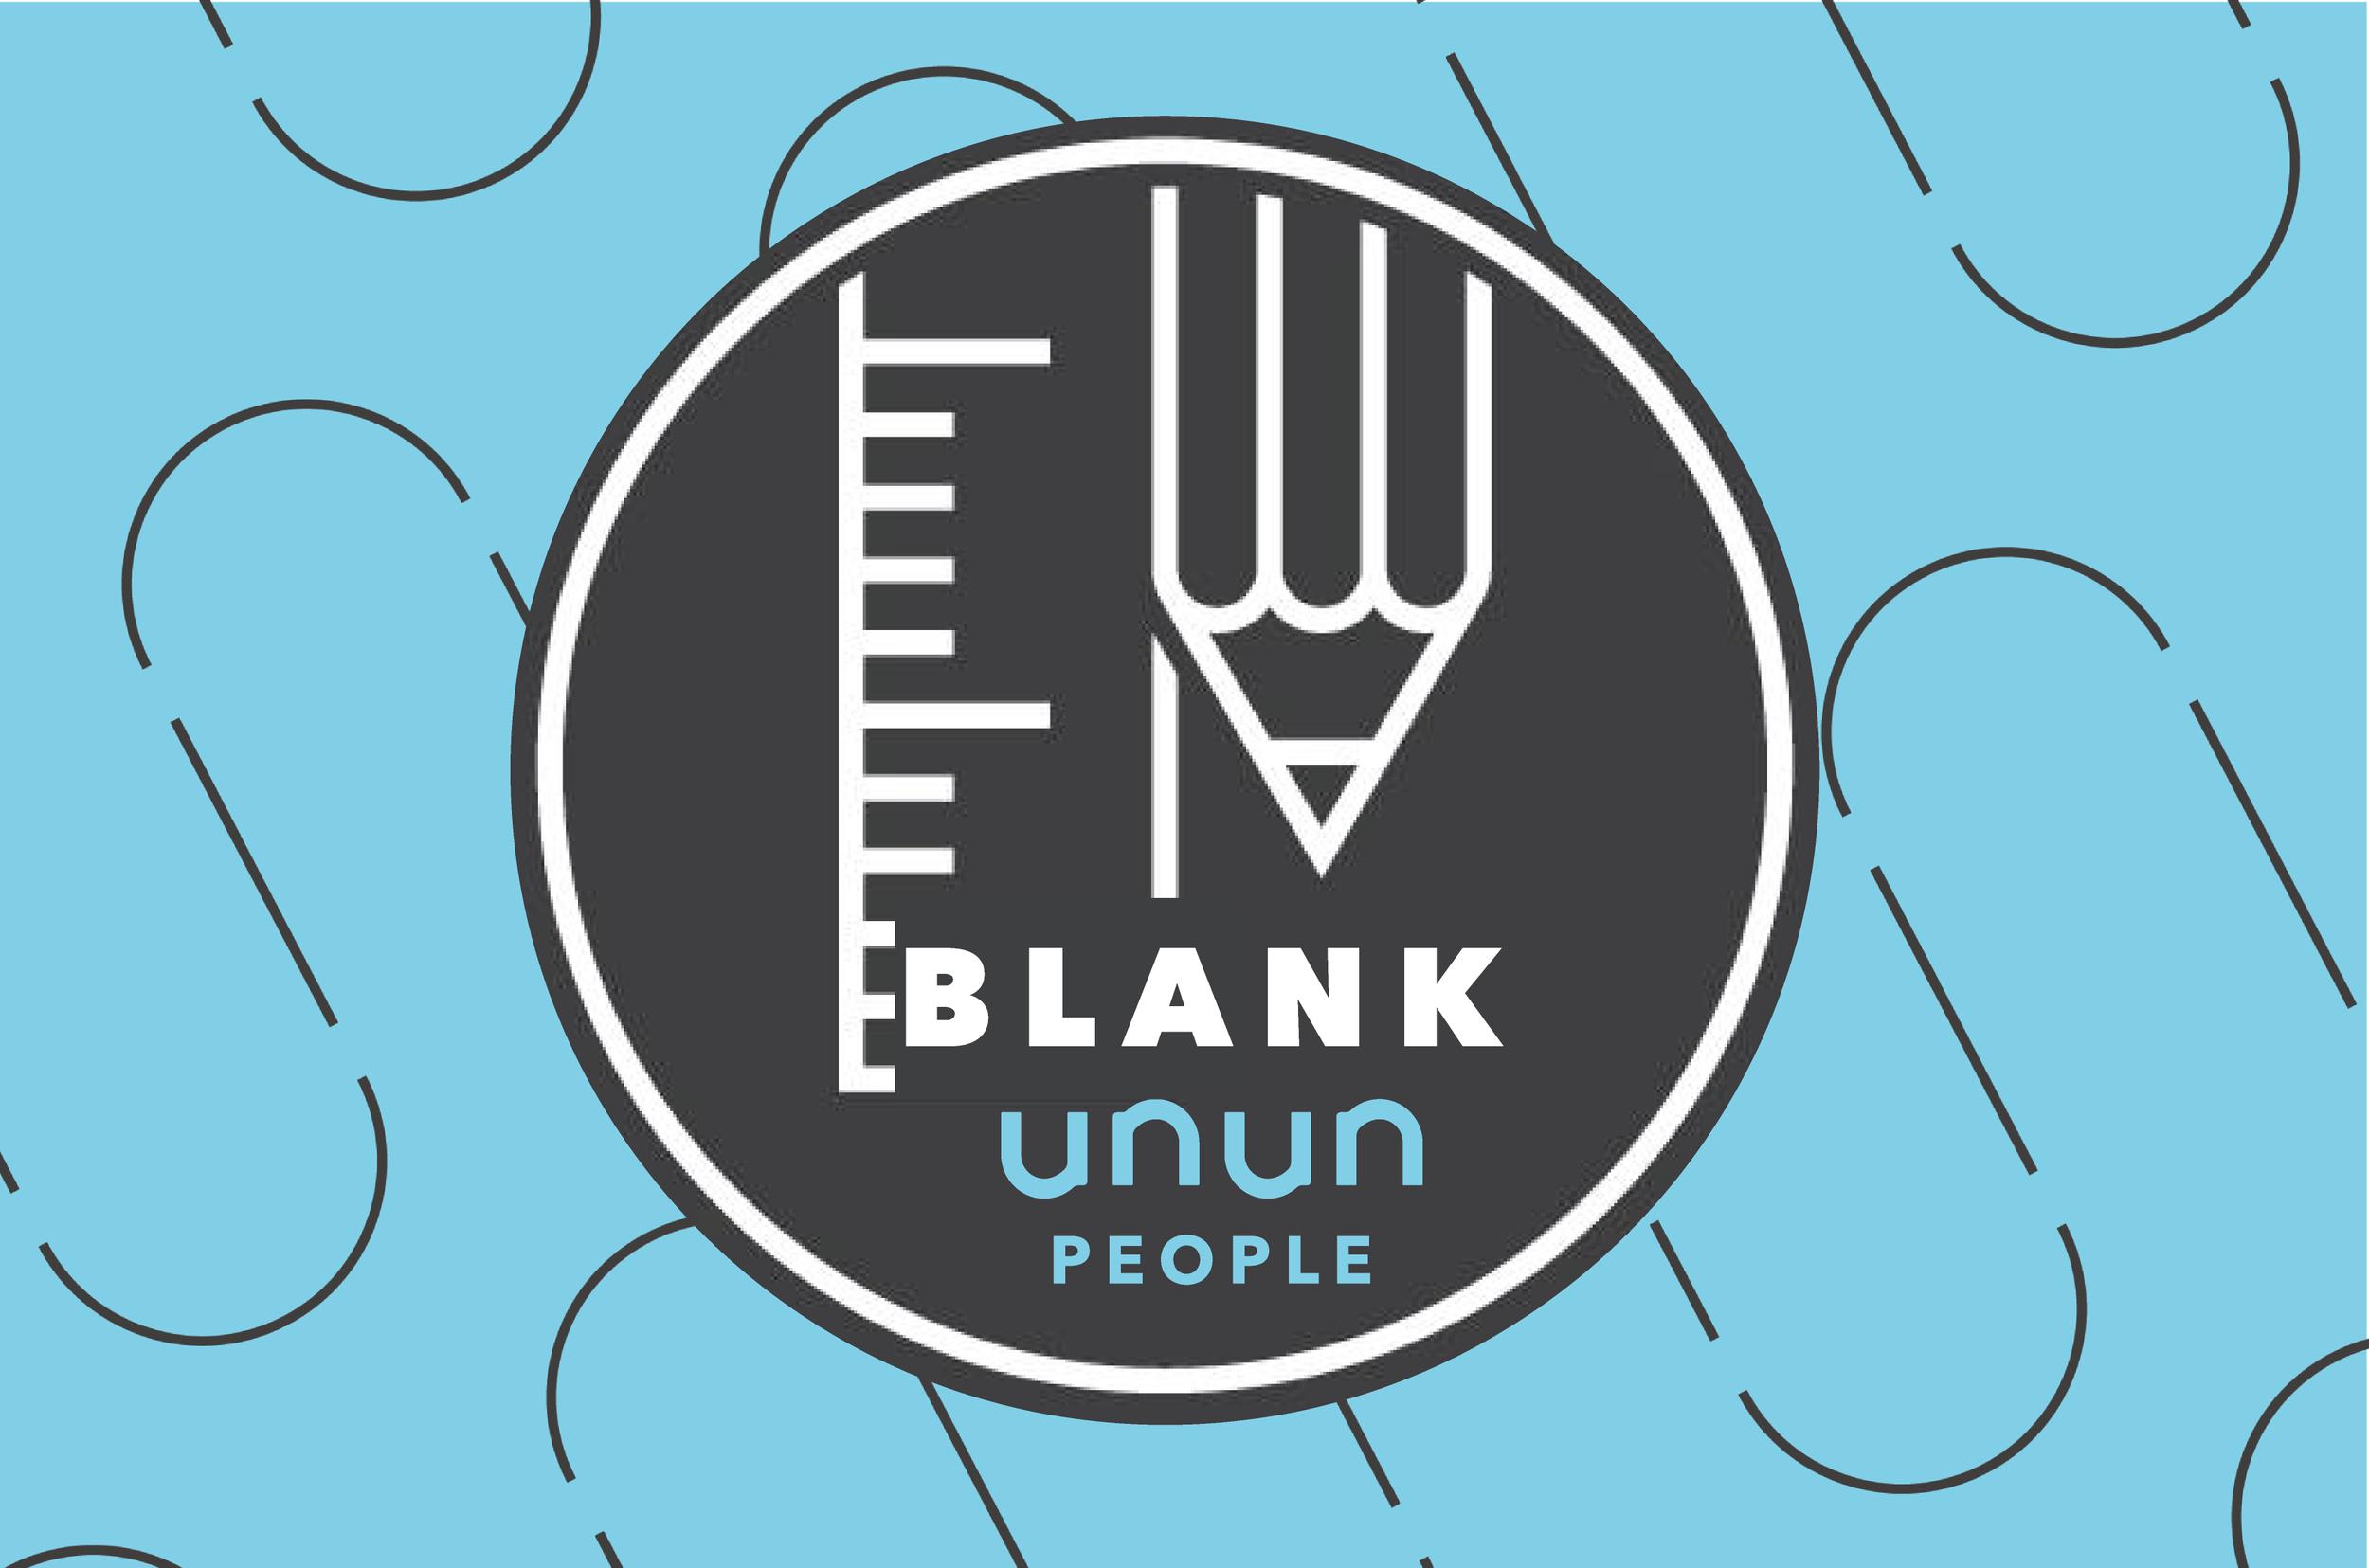 BLANK  Stationery Shop